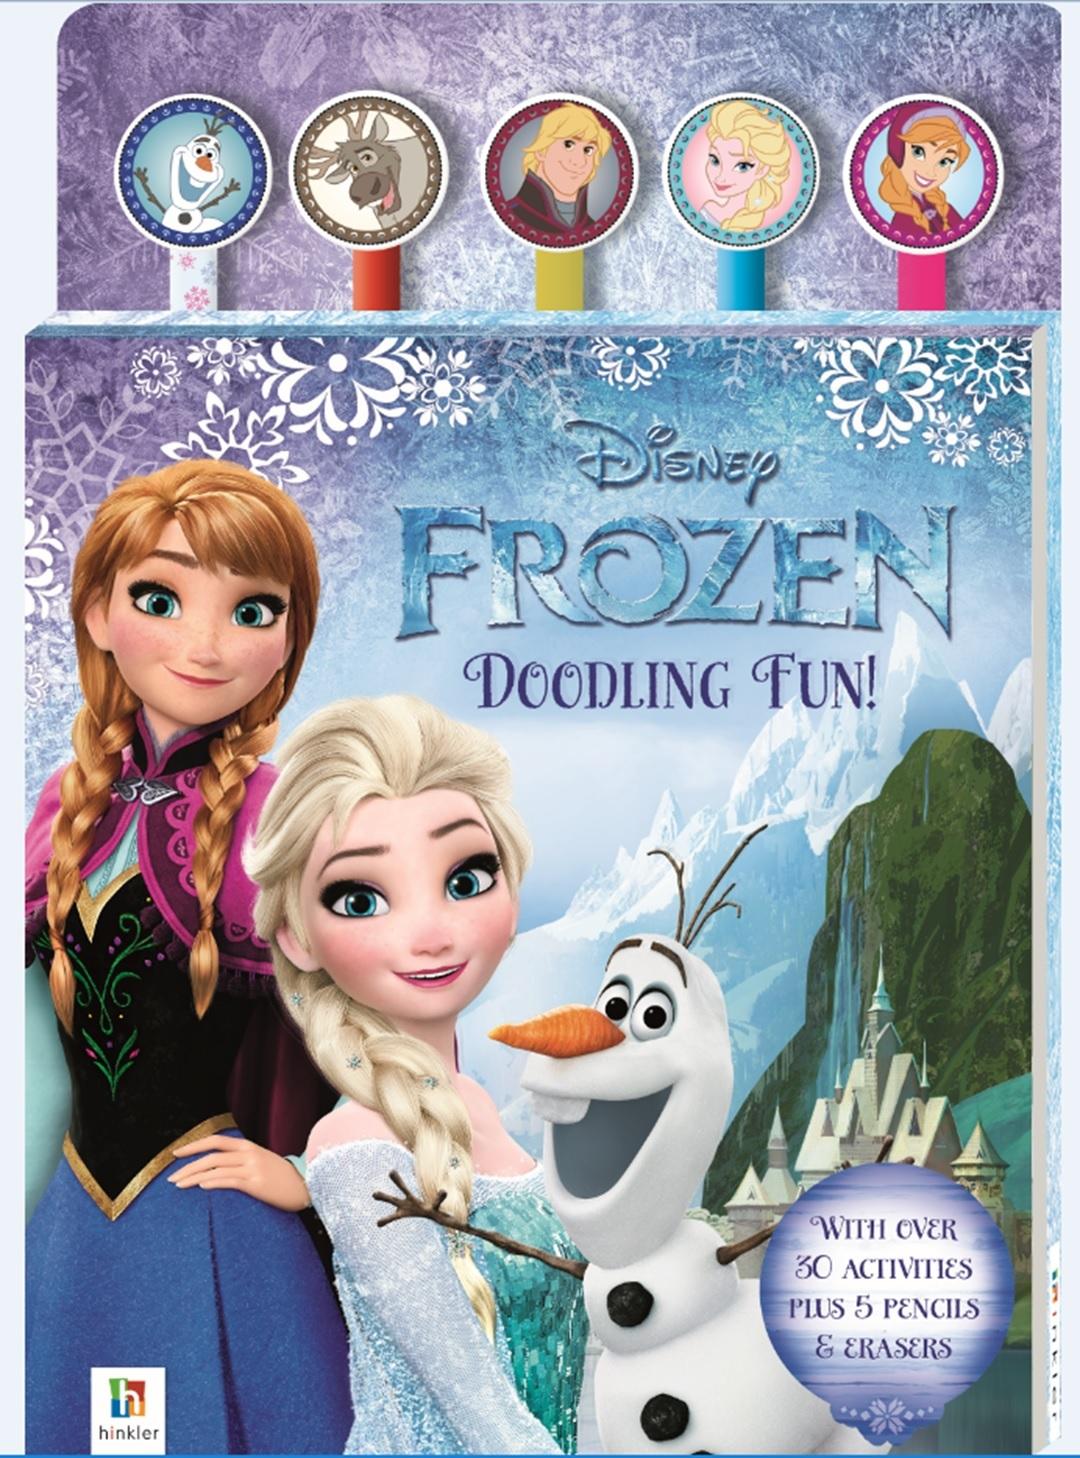 Disney Frozen: Pencil & Eraser - 5-Piece Set image